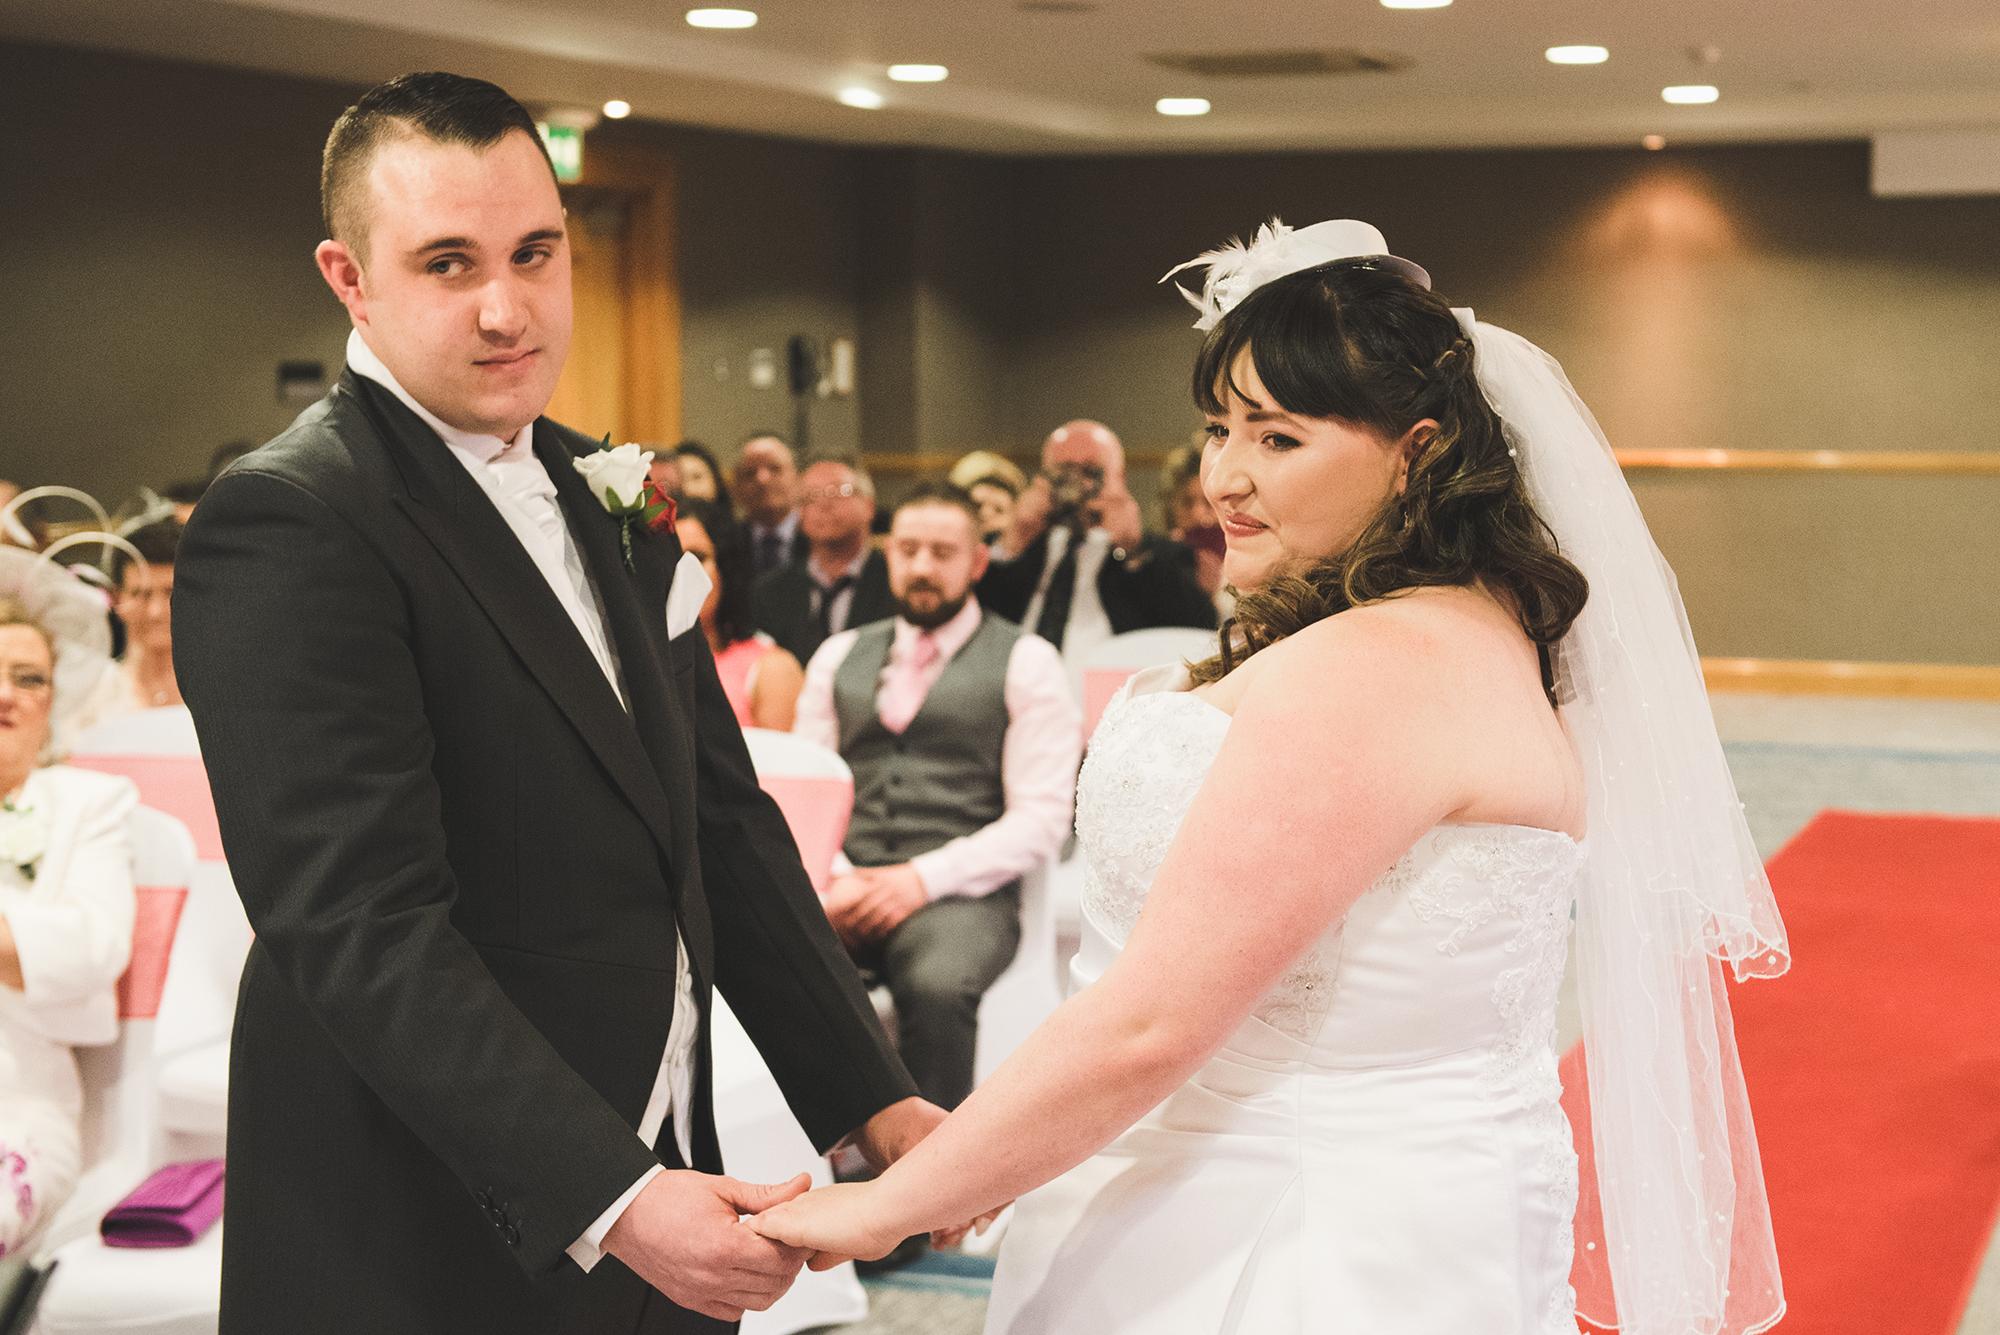 Northern_Ireland_Wedding_Photographer_Purephotoni_Ramada_Hotel_ceremony_bride_groom.jpg